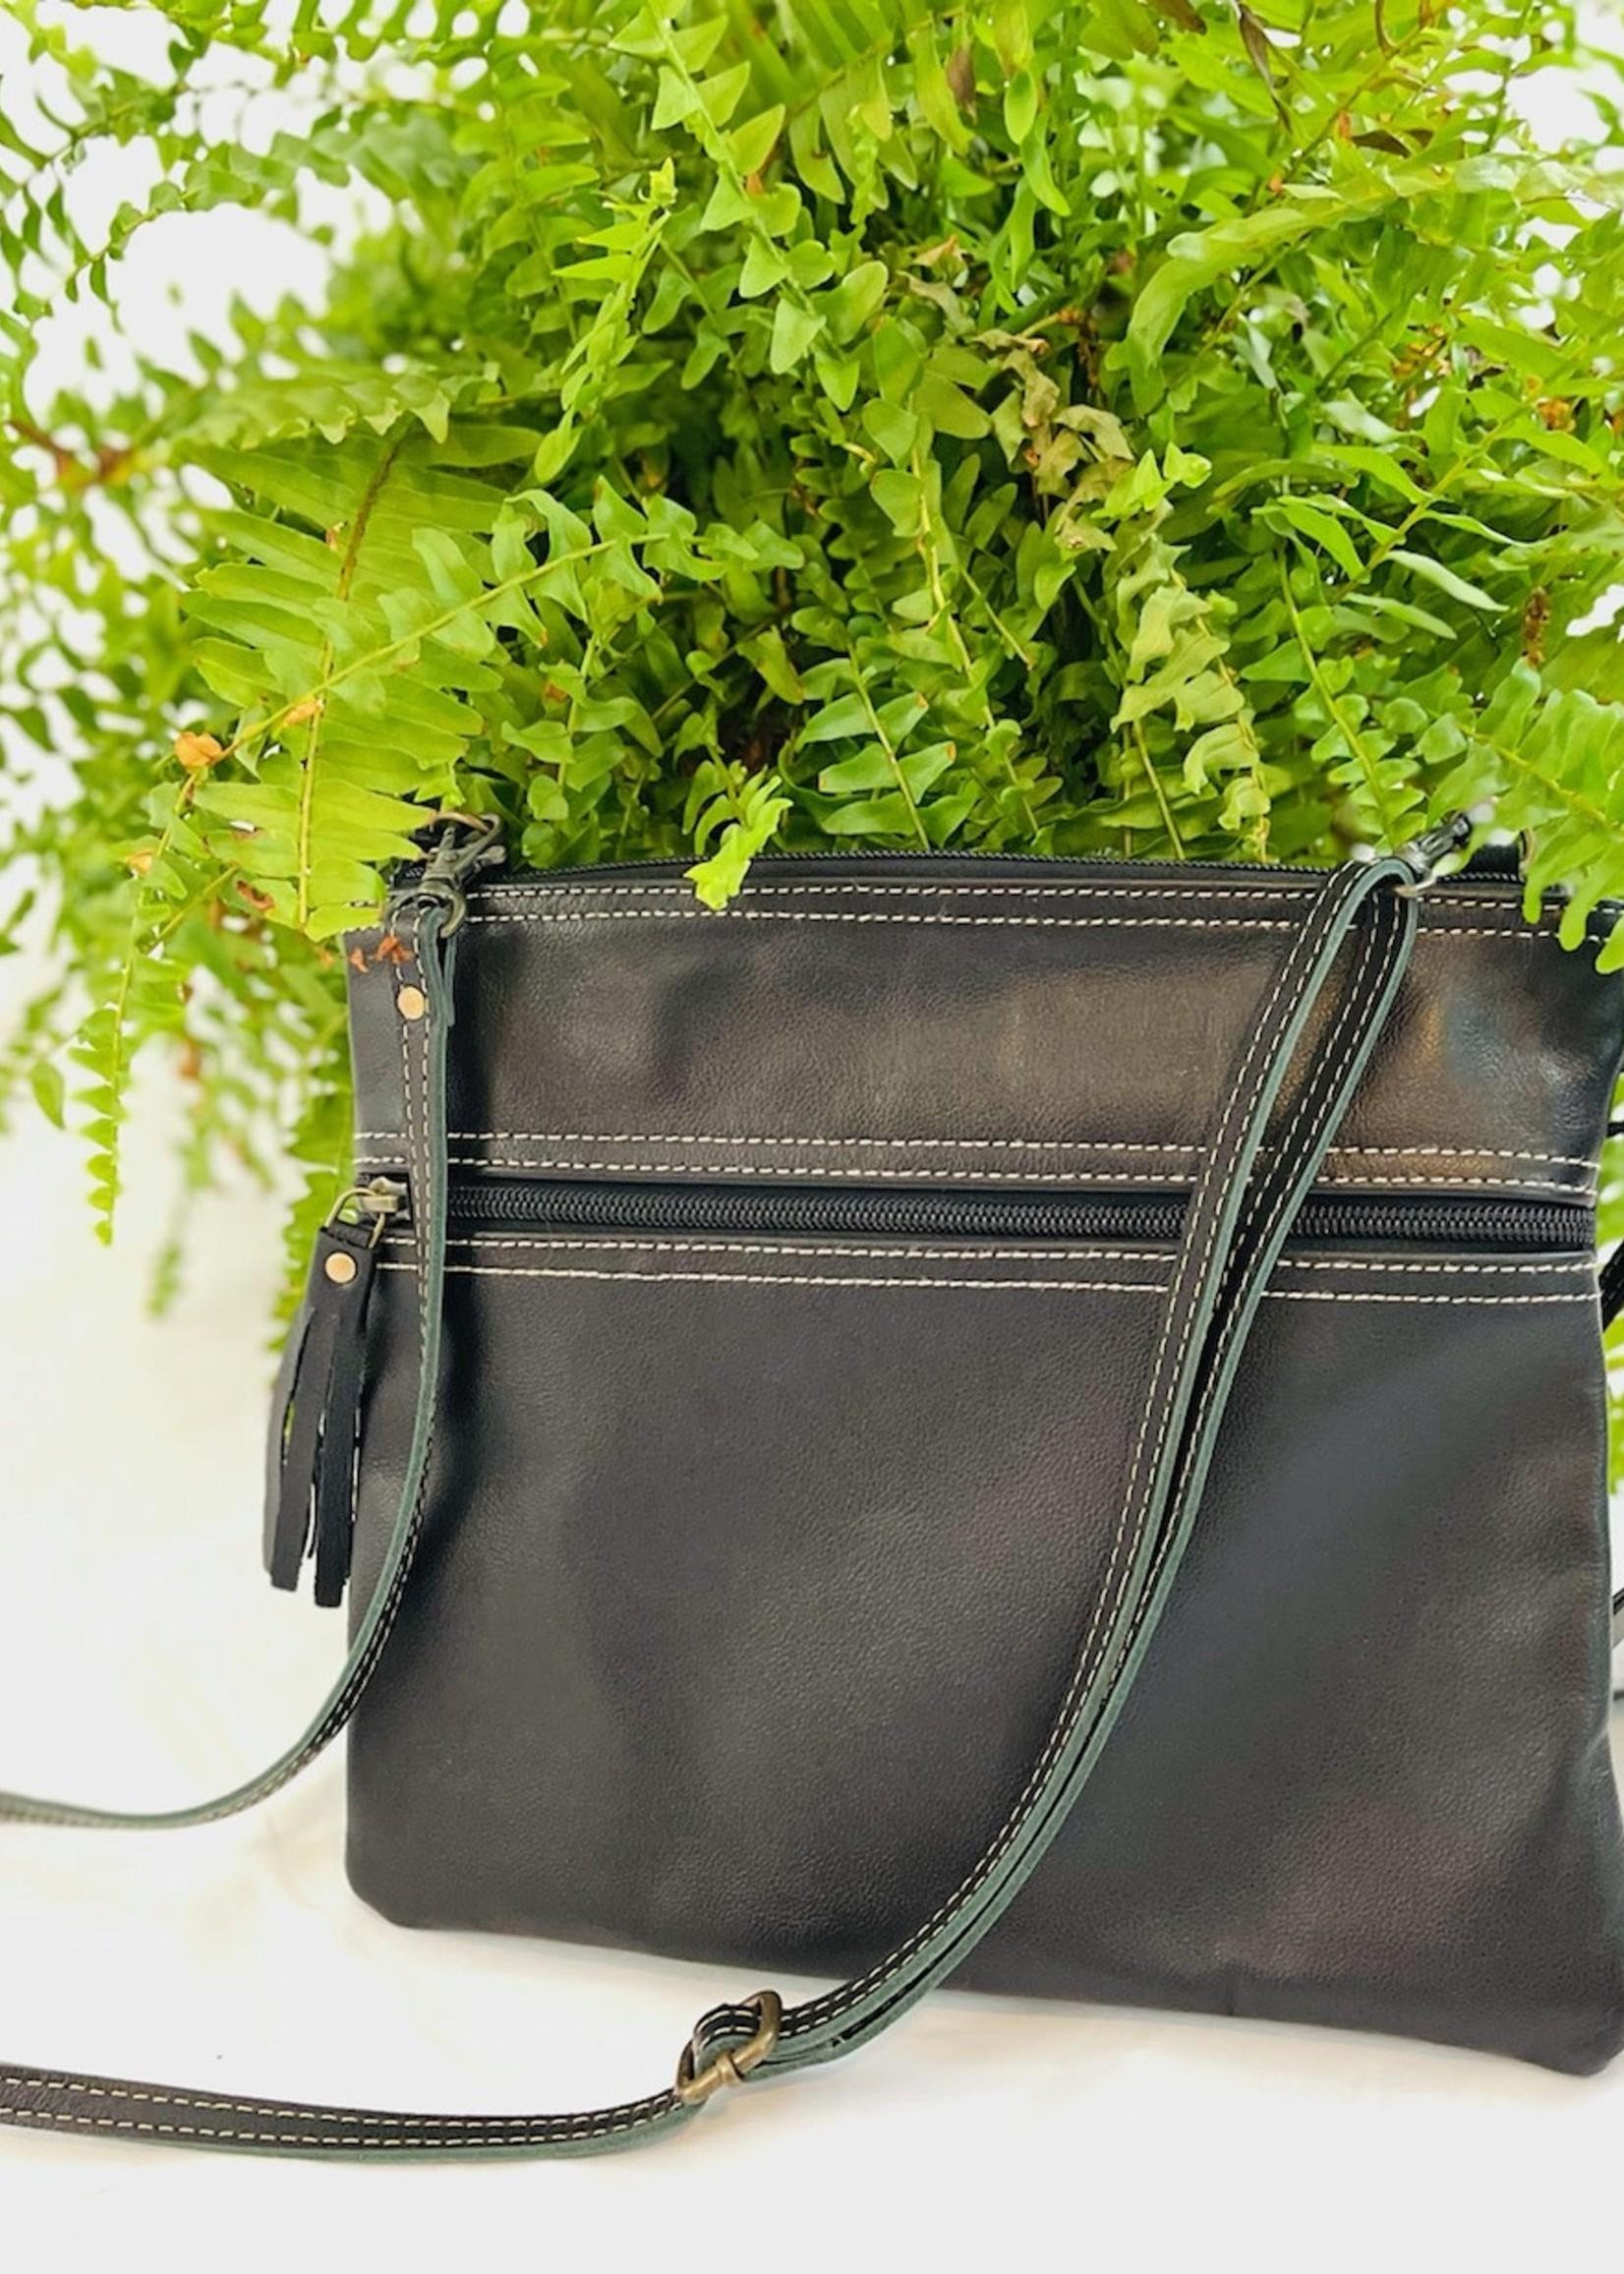 Black Beauty Leather Bag